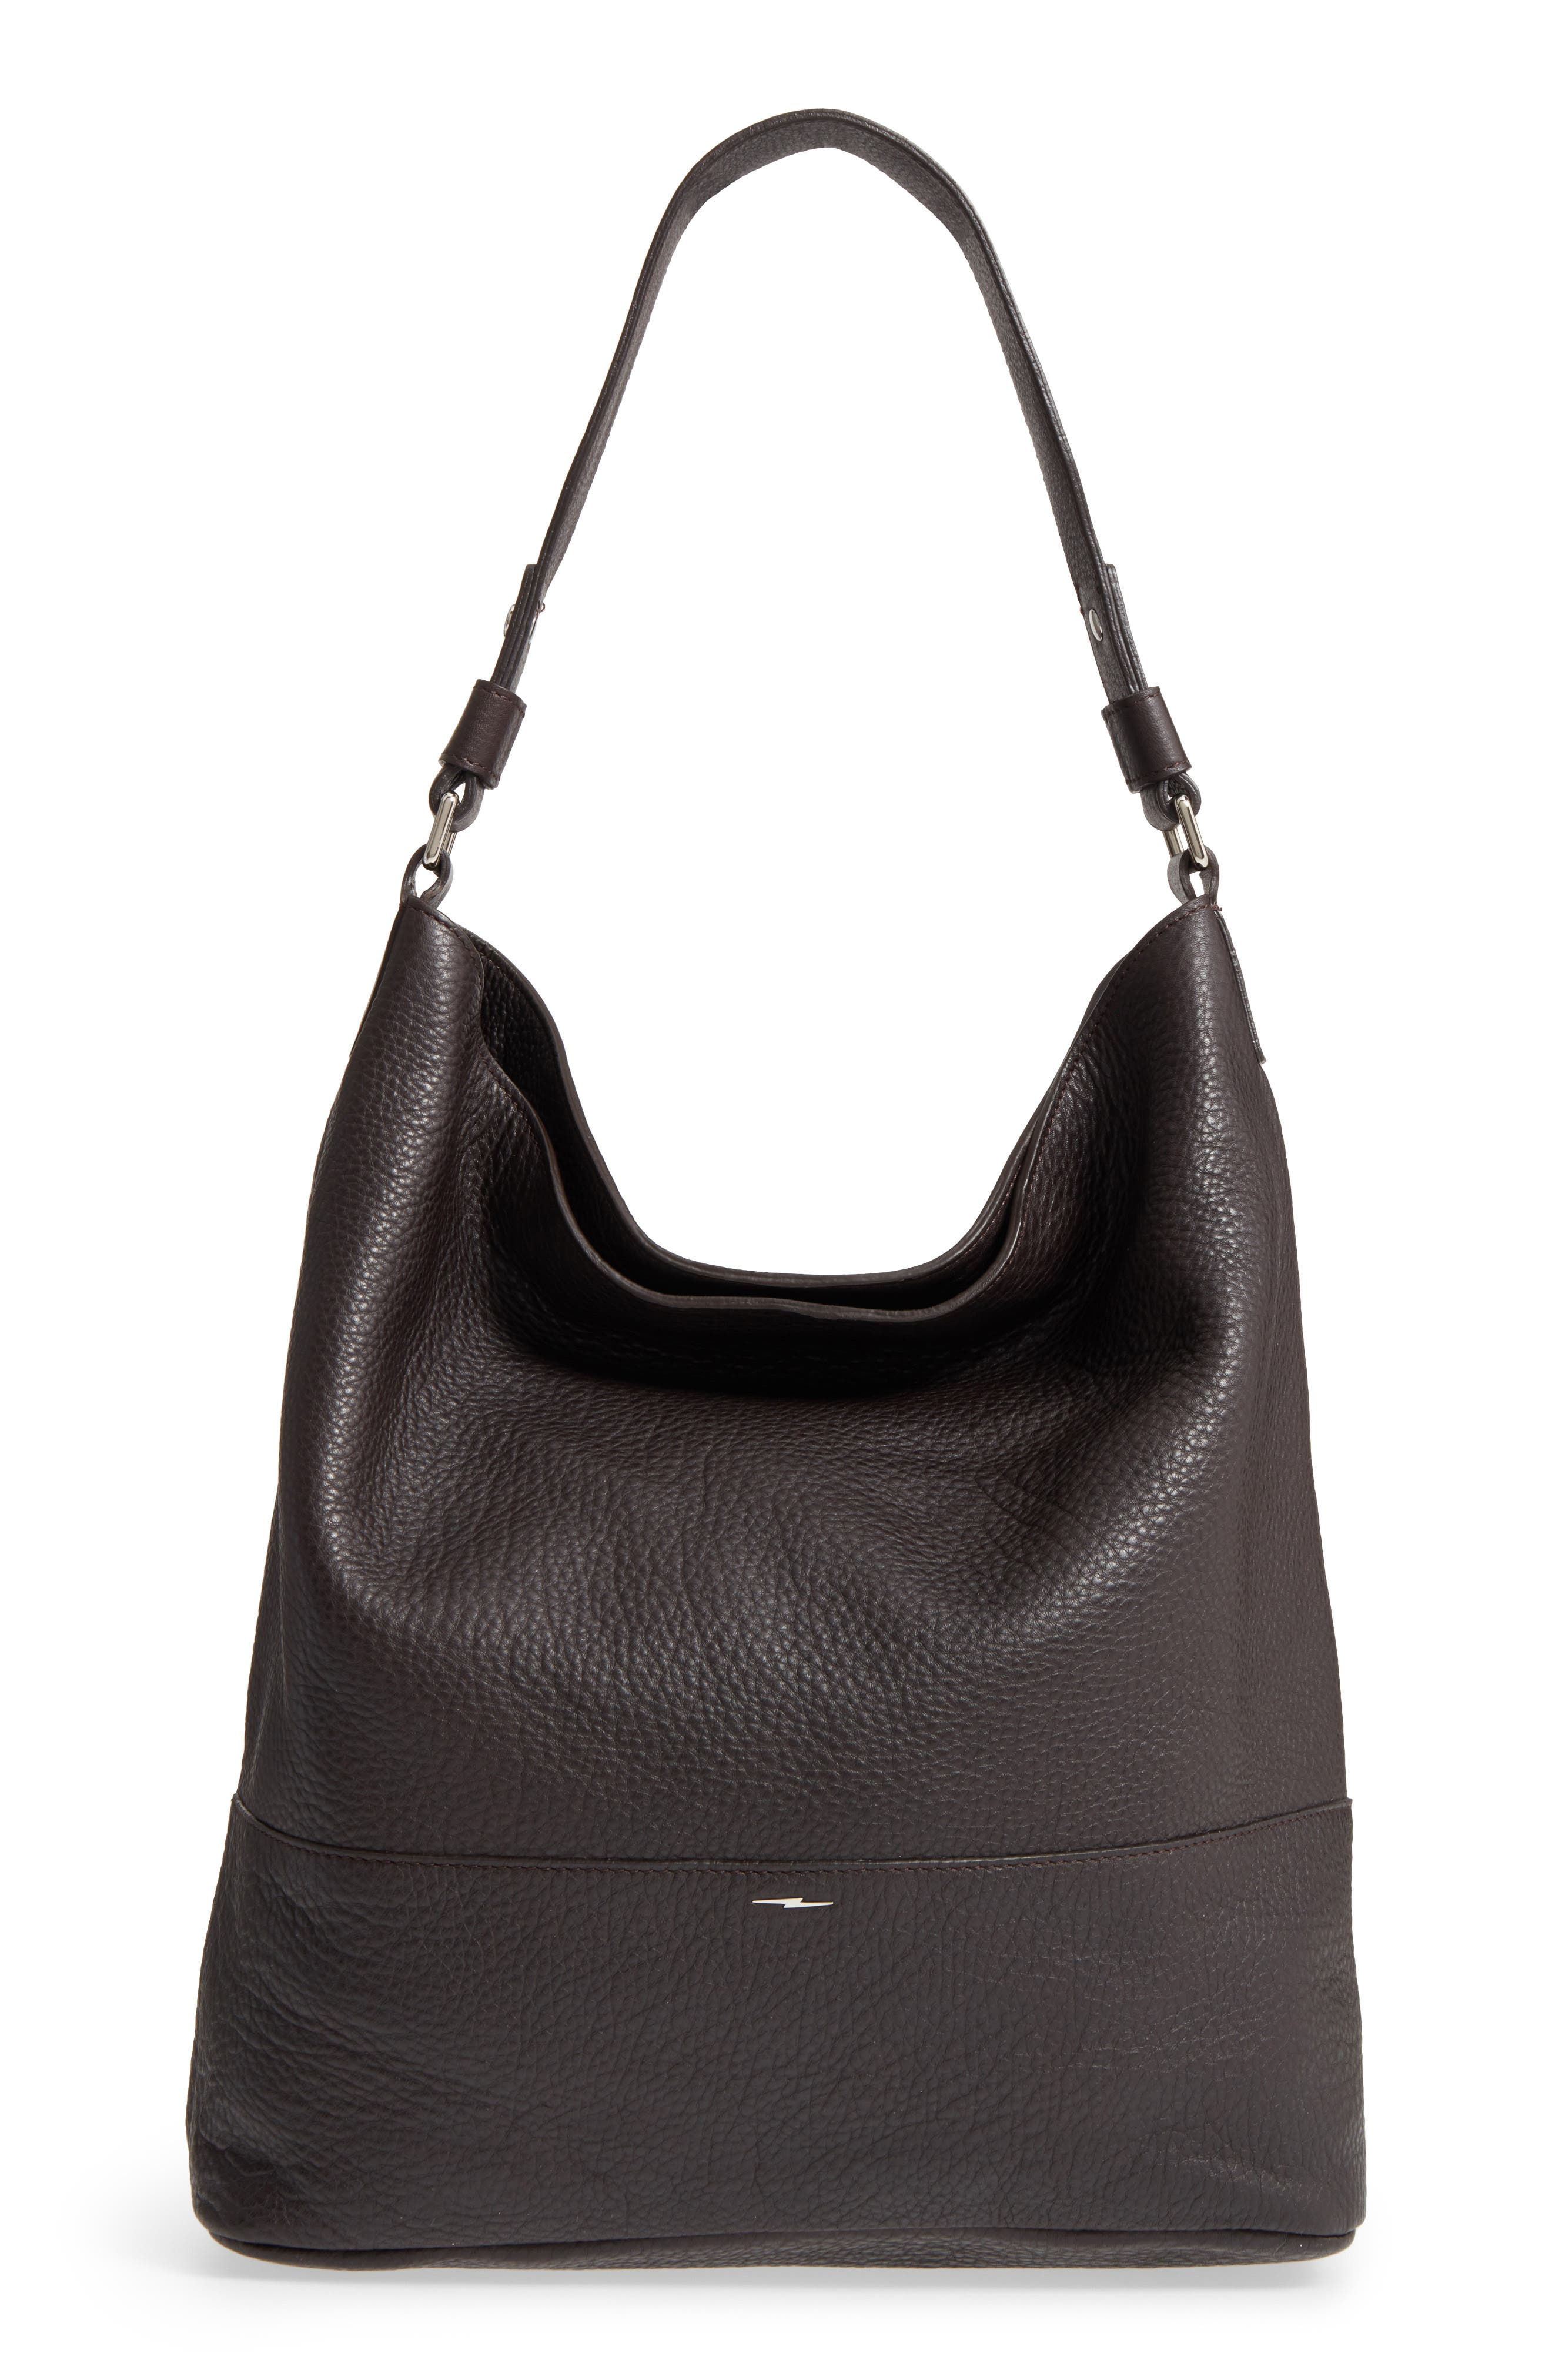 Relaxed Calfskin Leather Hobo Bag,                             Main thumbnail 1, color,                             240